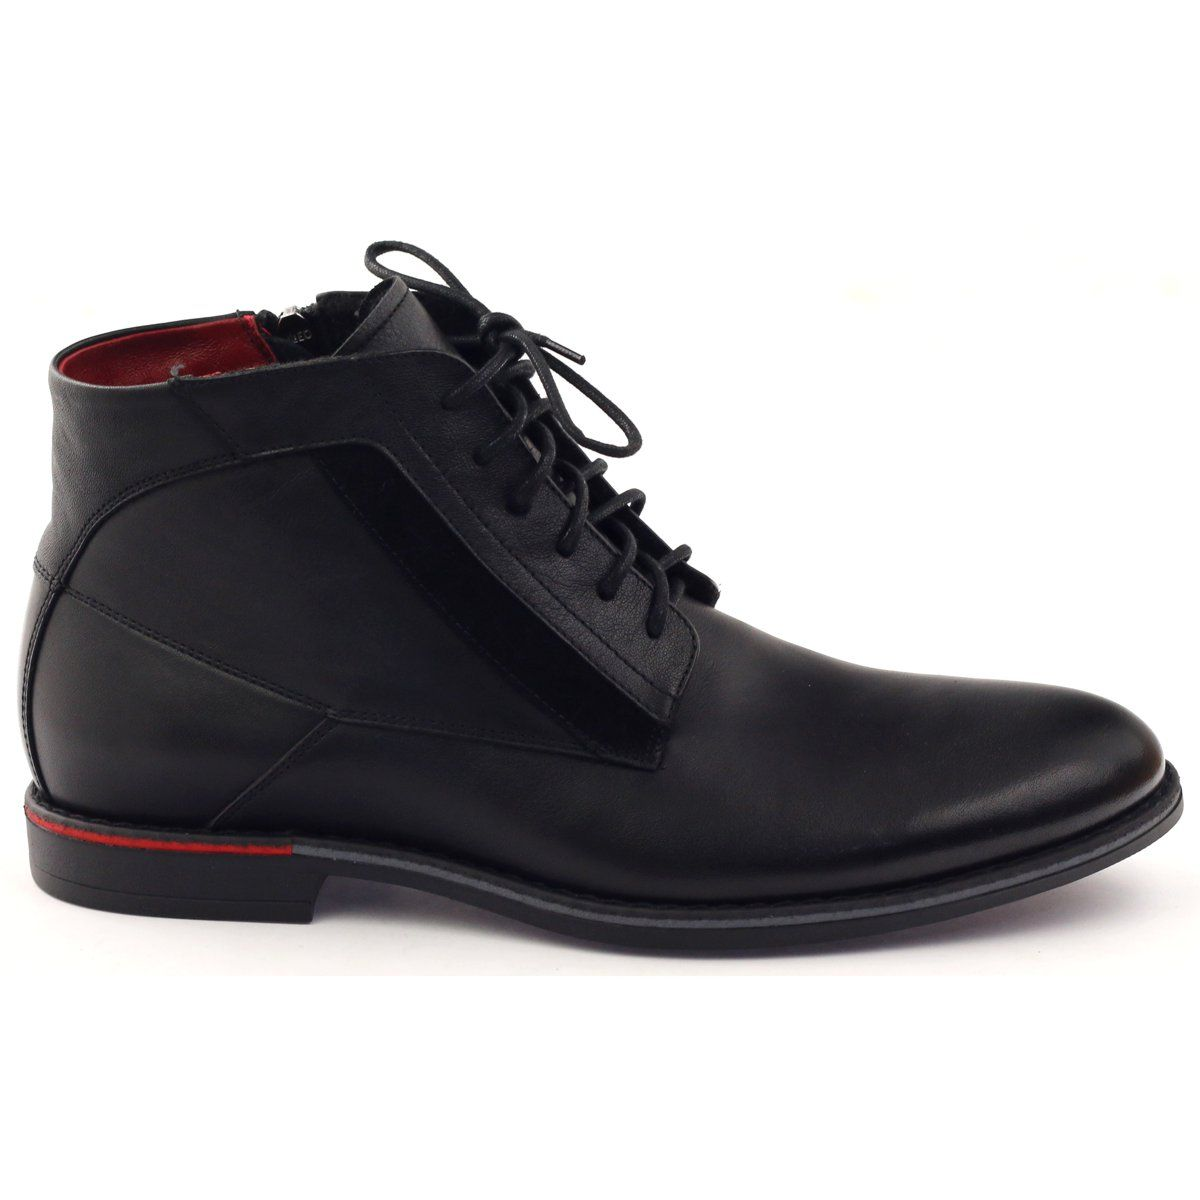 Botki Sztyblety Pilpol Pc6007 Czarne Zapatos Hombre Zapatos Botines Hombre